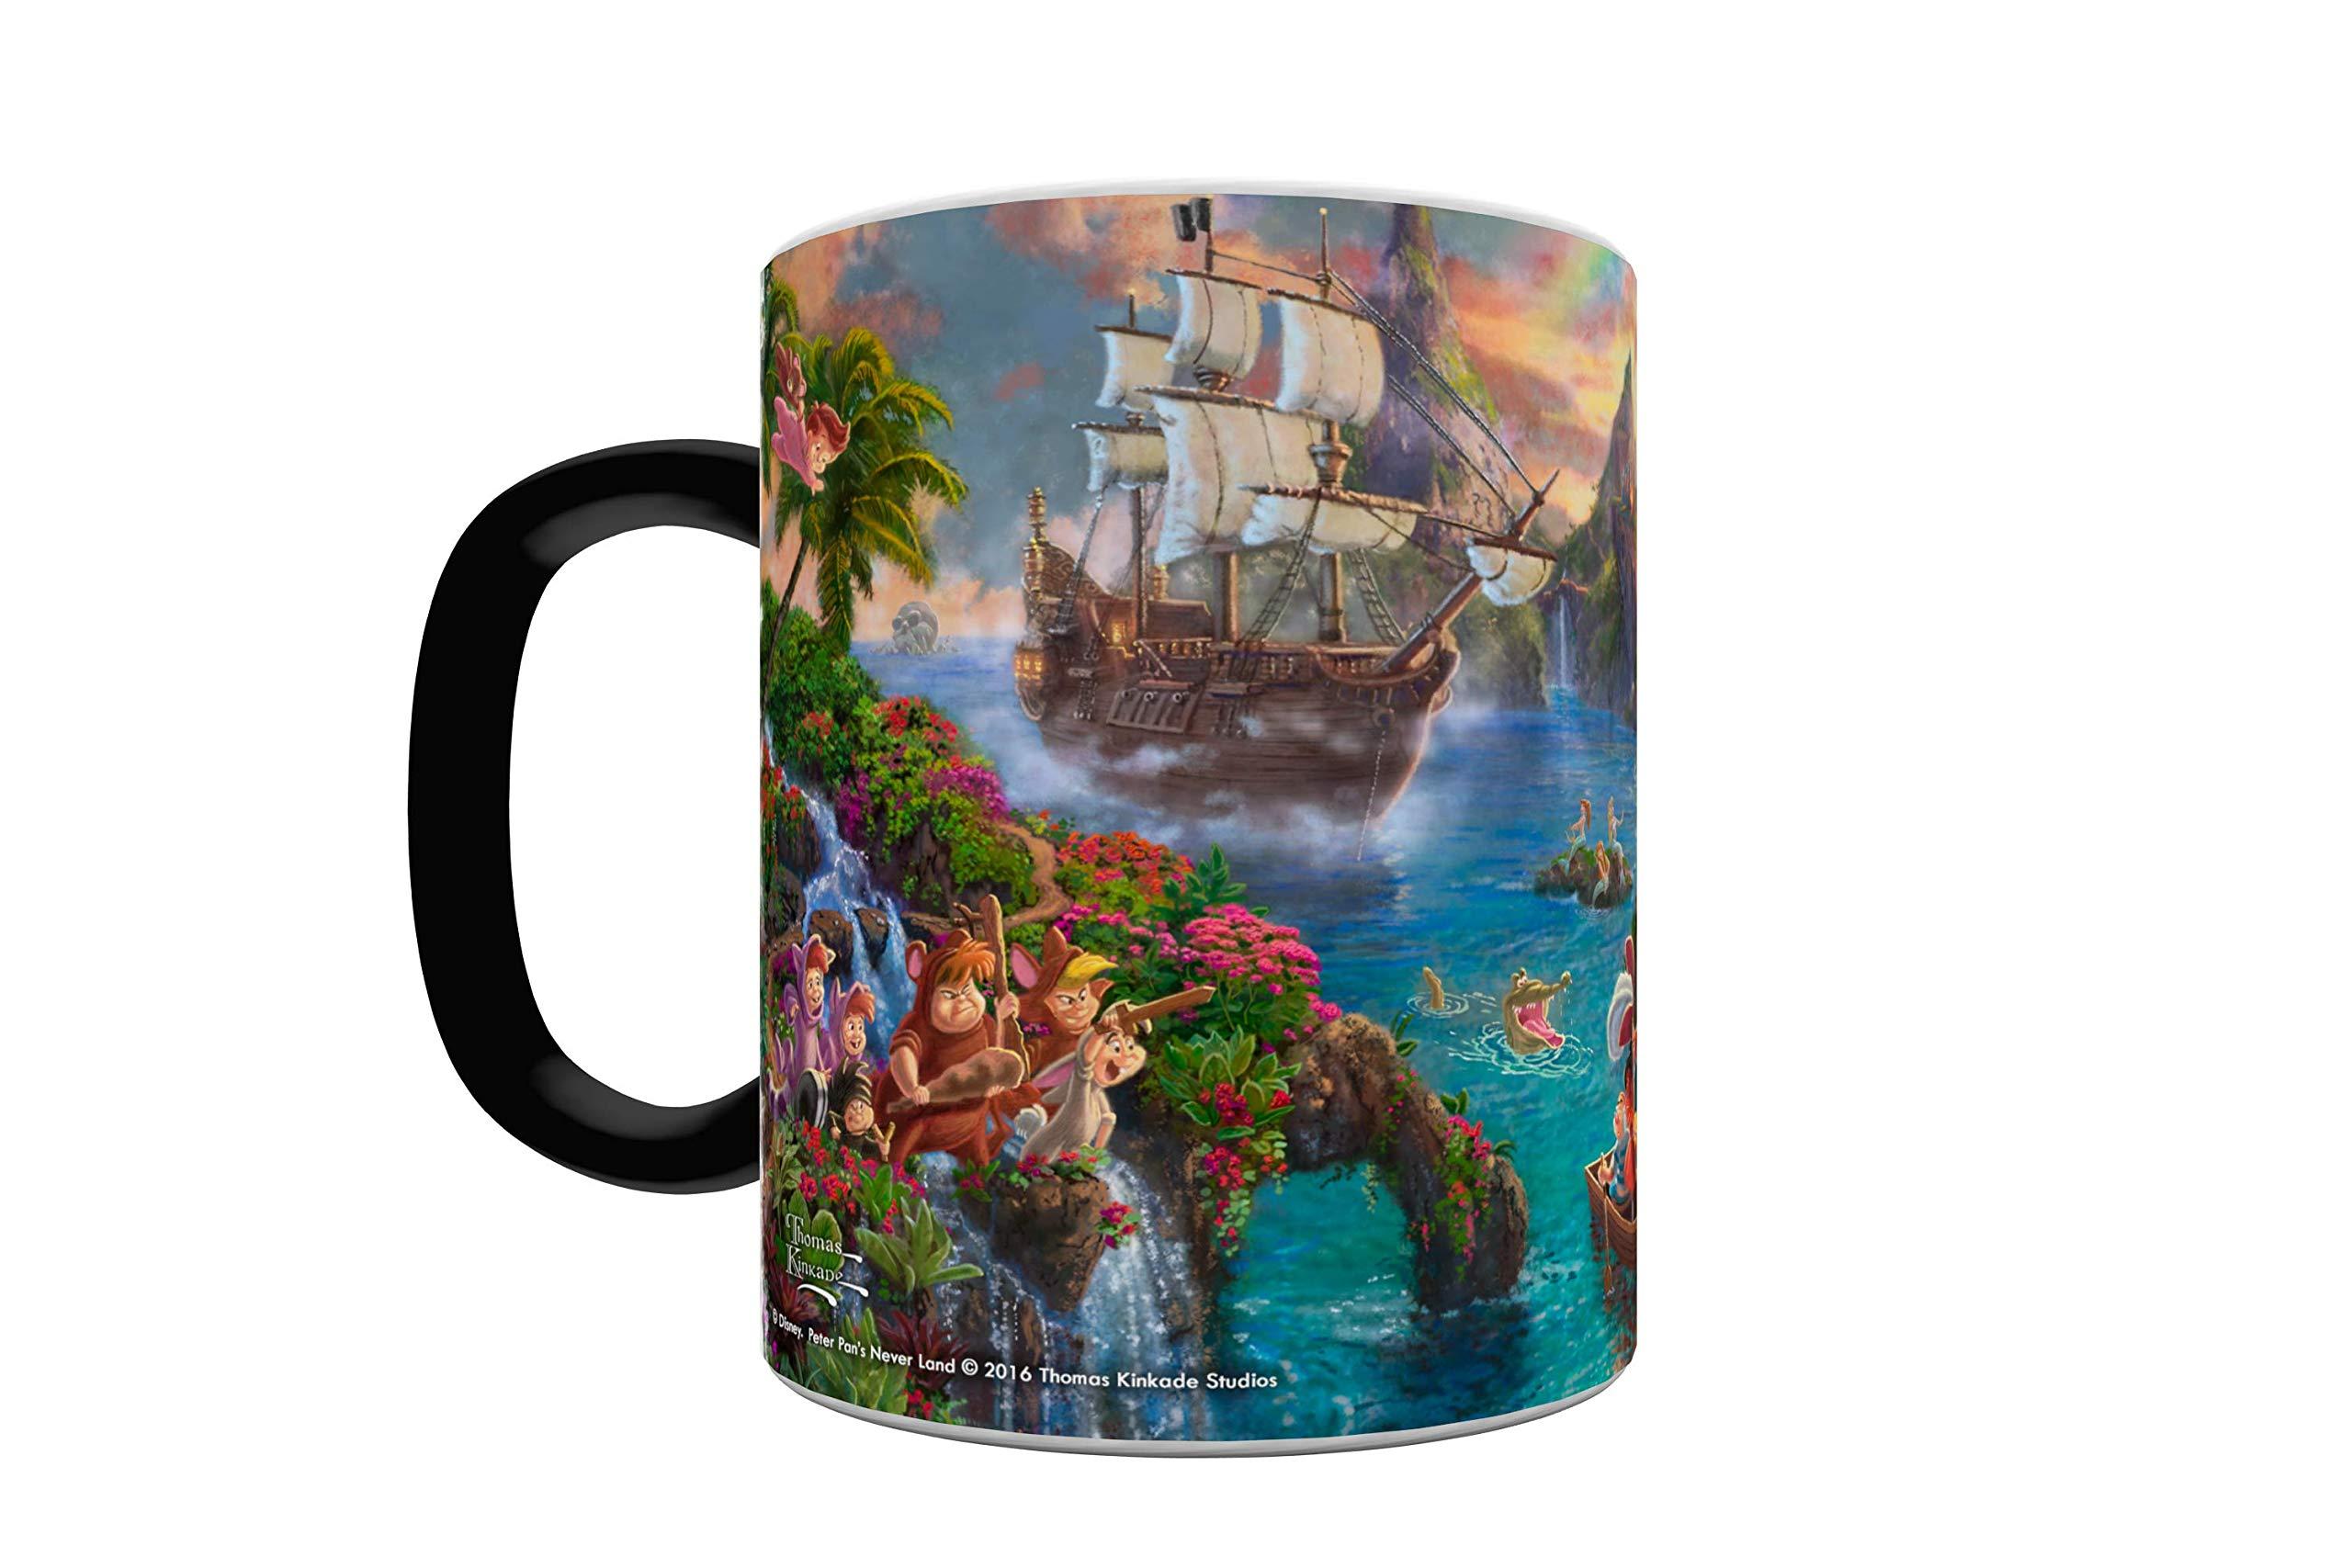 Disney - Peter Pan - Neverland - One 11 oz Morphing Mugs Color Changing Heat Sensitive Ceramic Mug – Image Revealed When HOT Liquid Is Added!